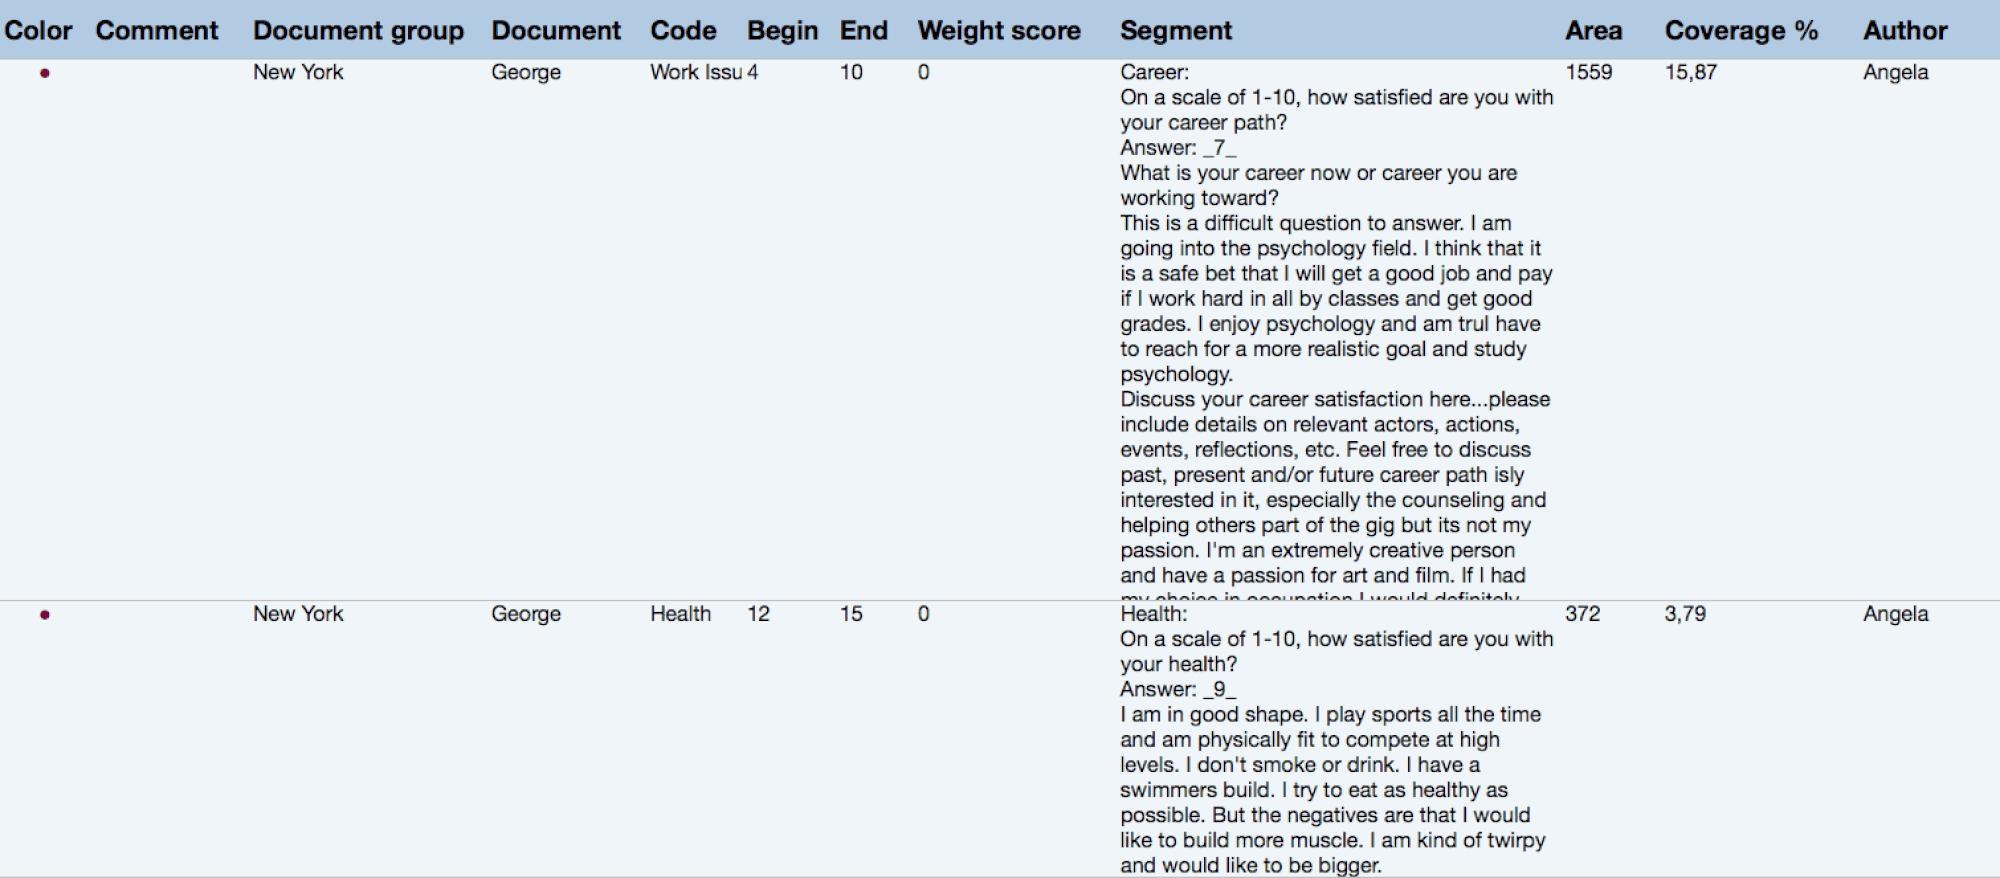 Export coded segments